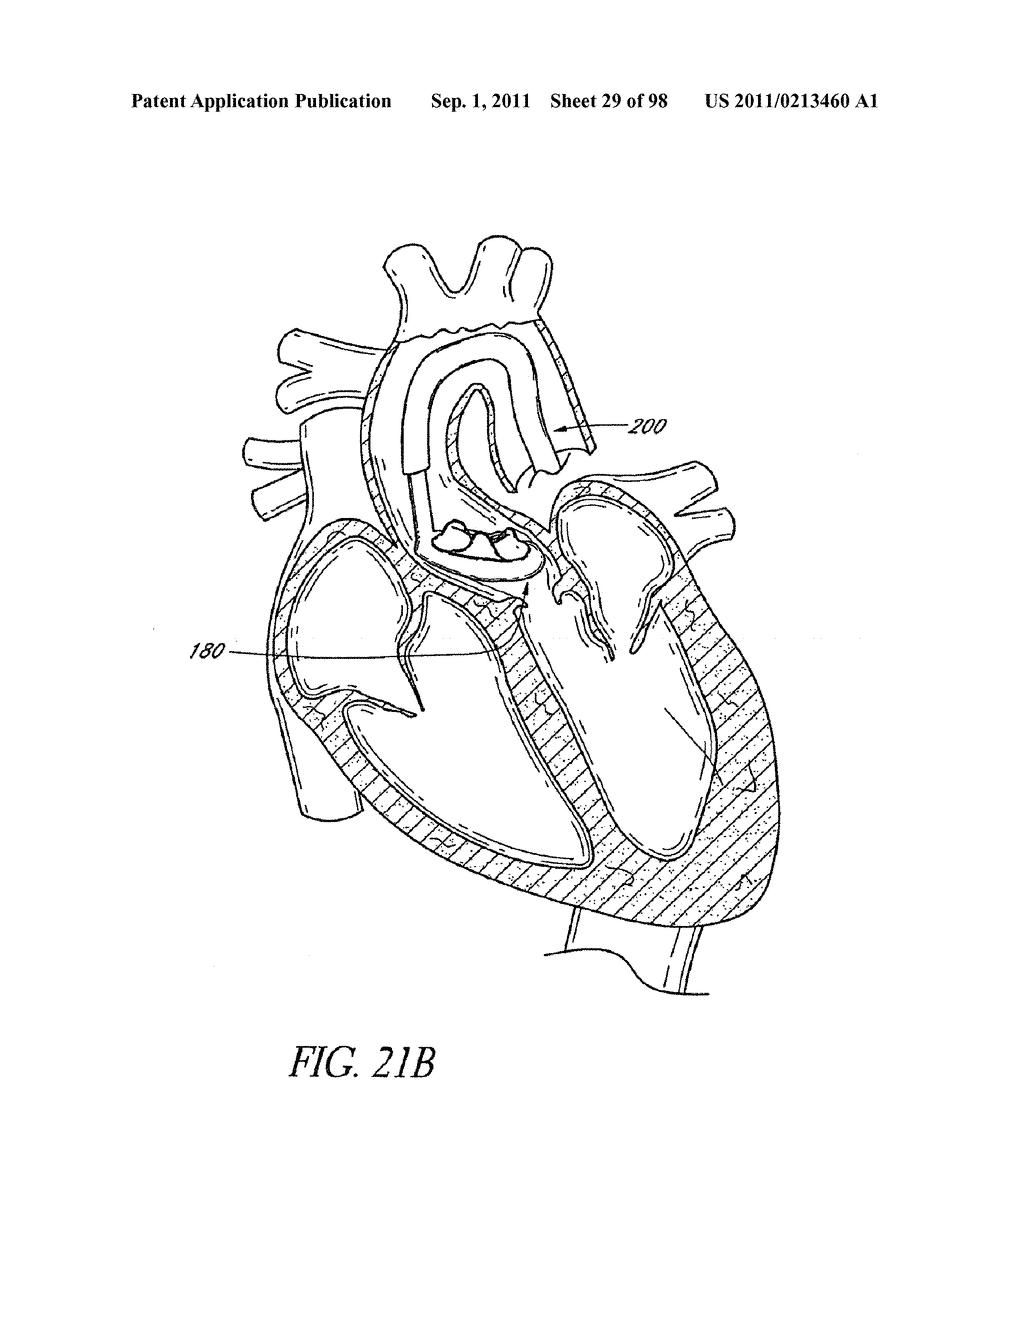 Schematic Diagram Of Heart Structure Diagram